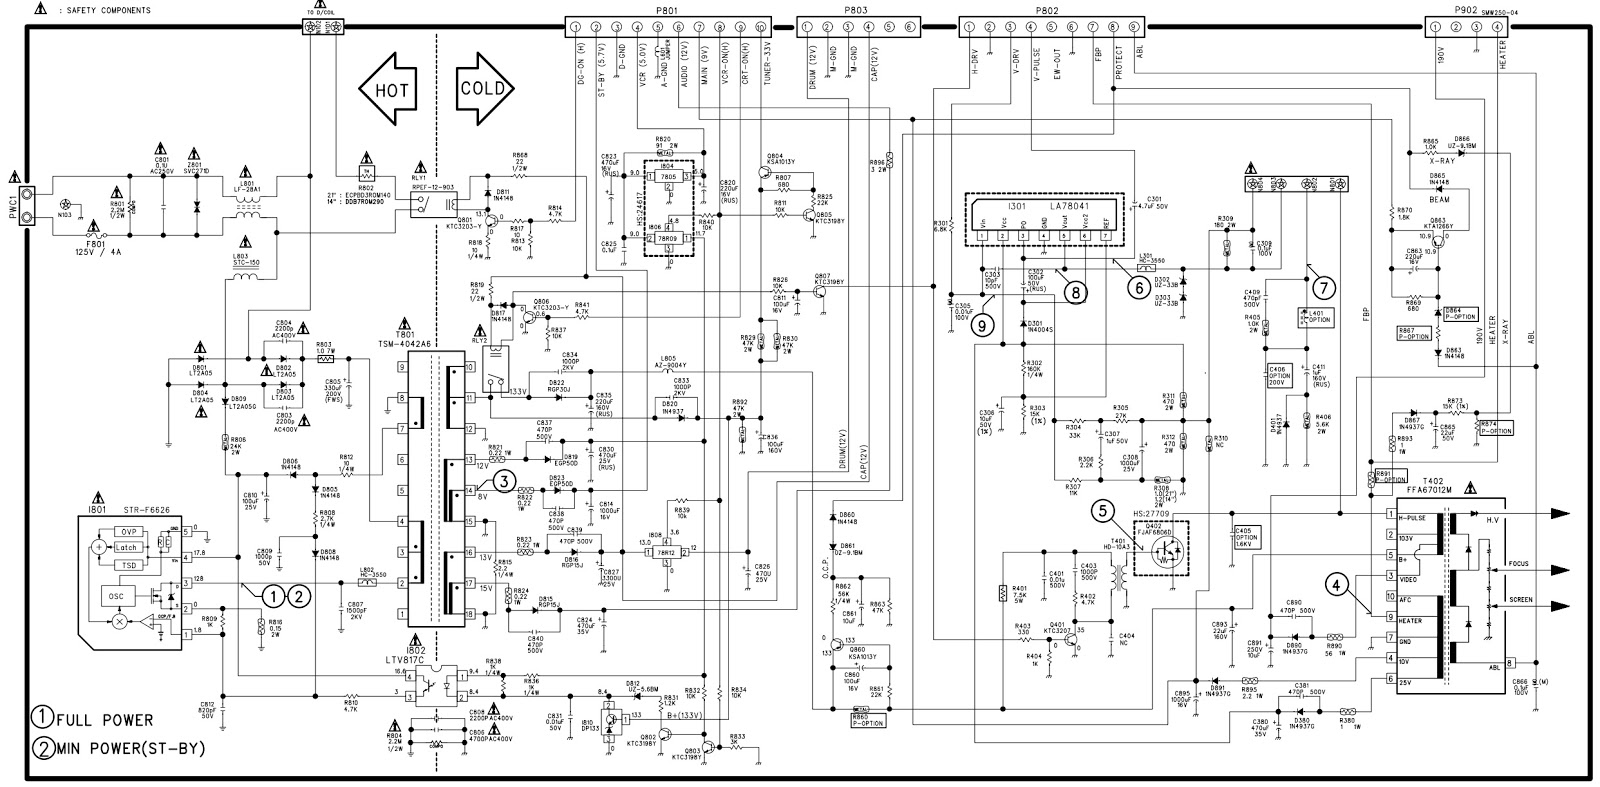 DaewooSony VX 14A1 – VX14AW1 – VX21AW1 – Circuit Diagram